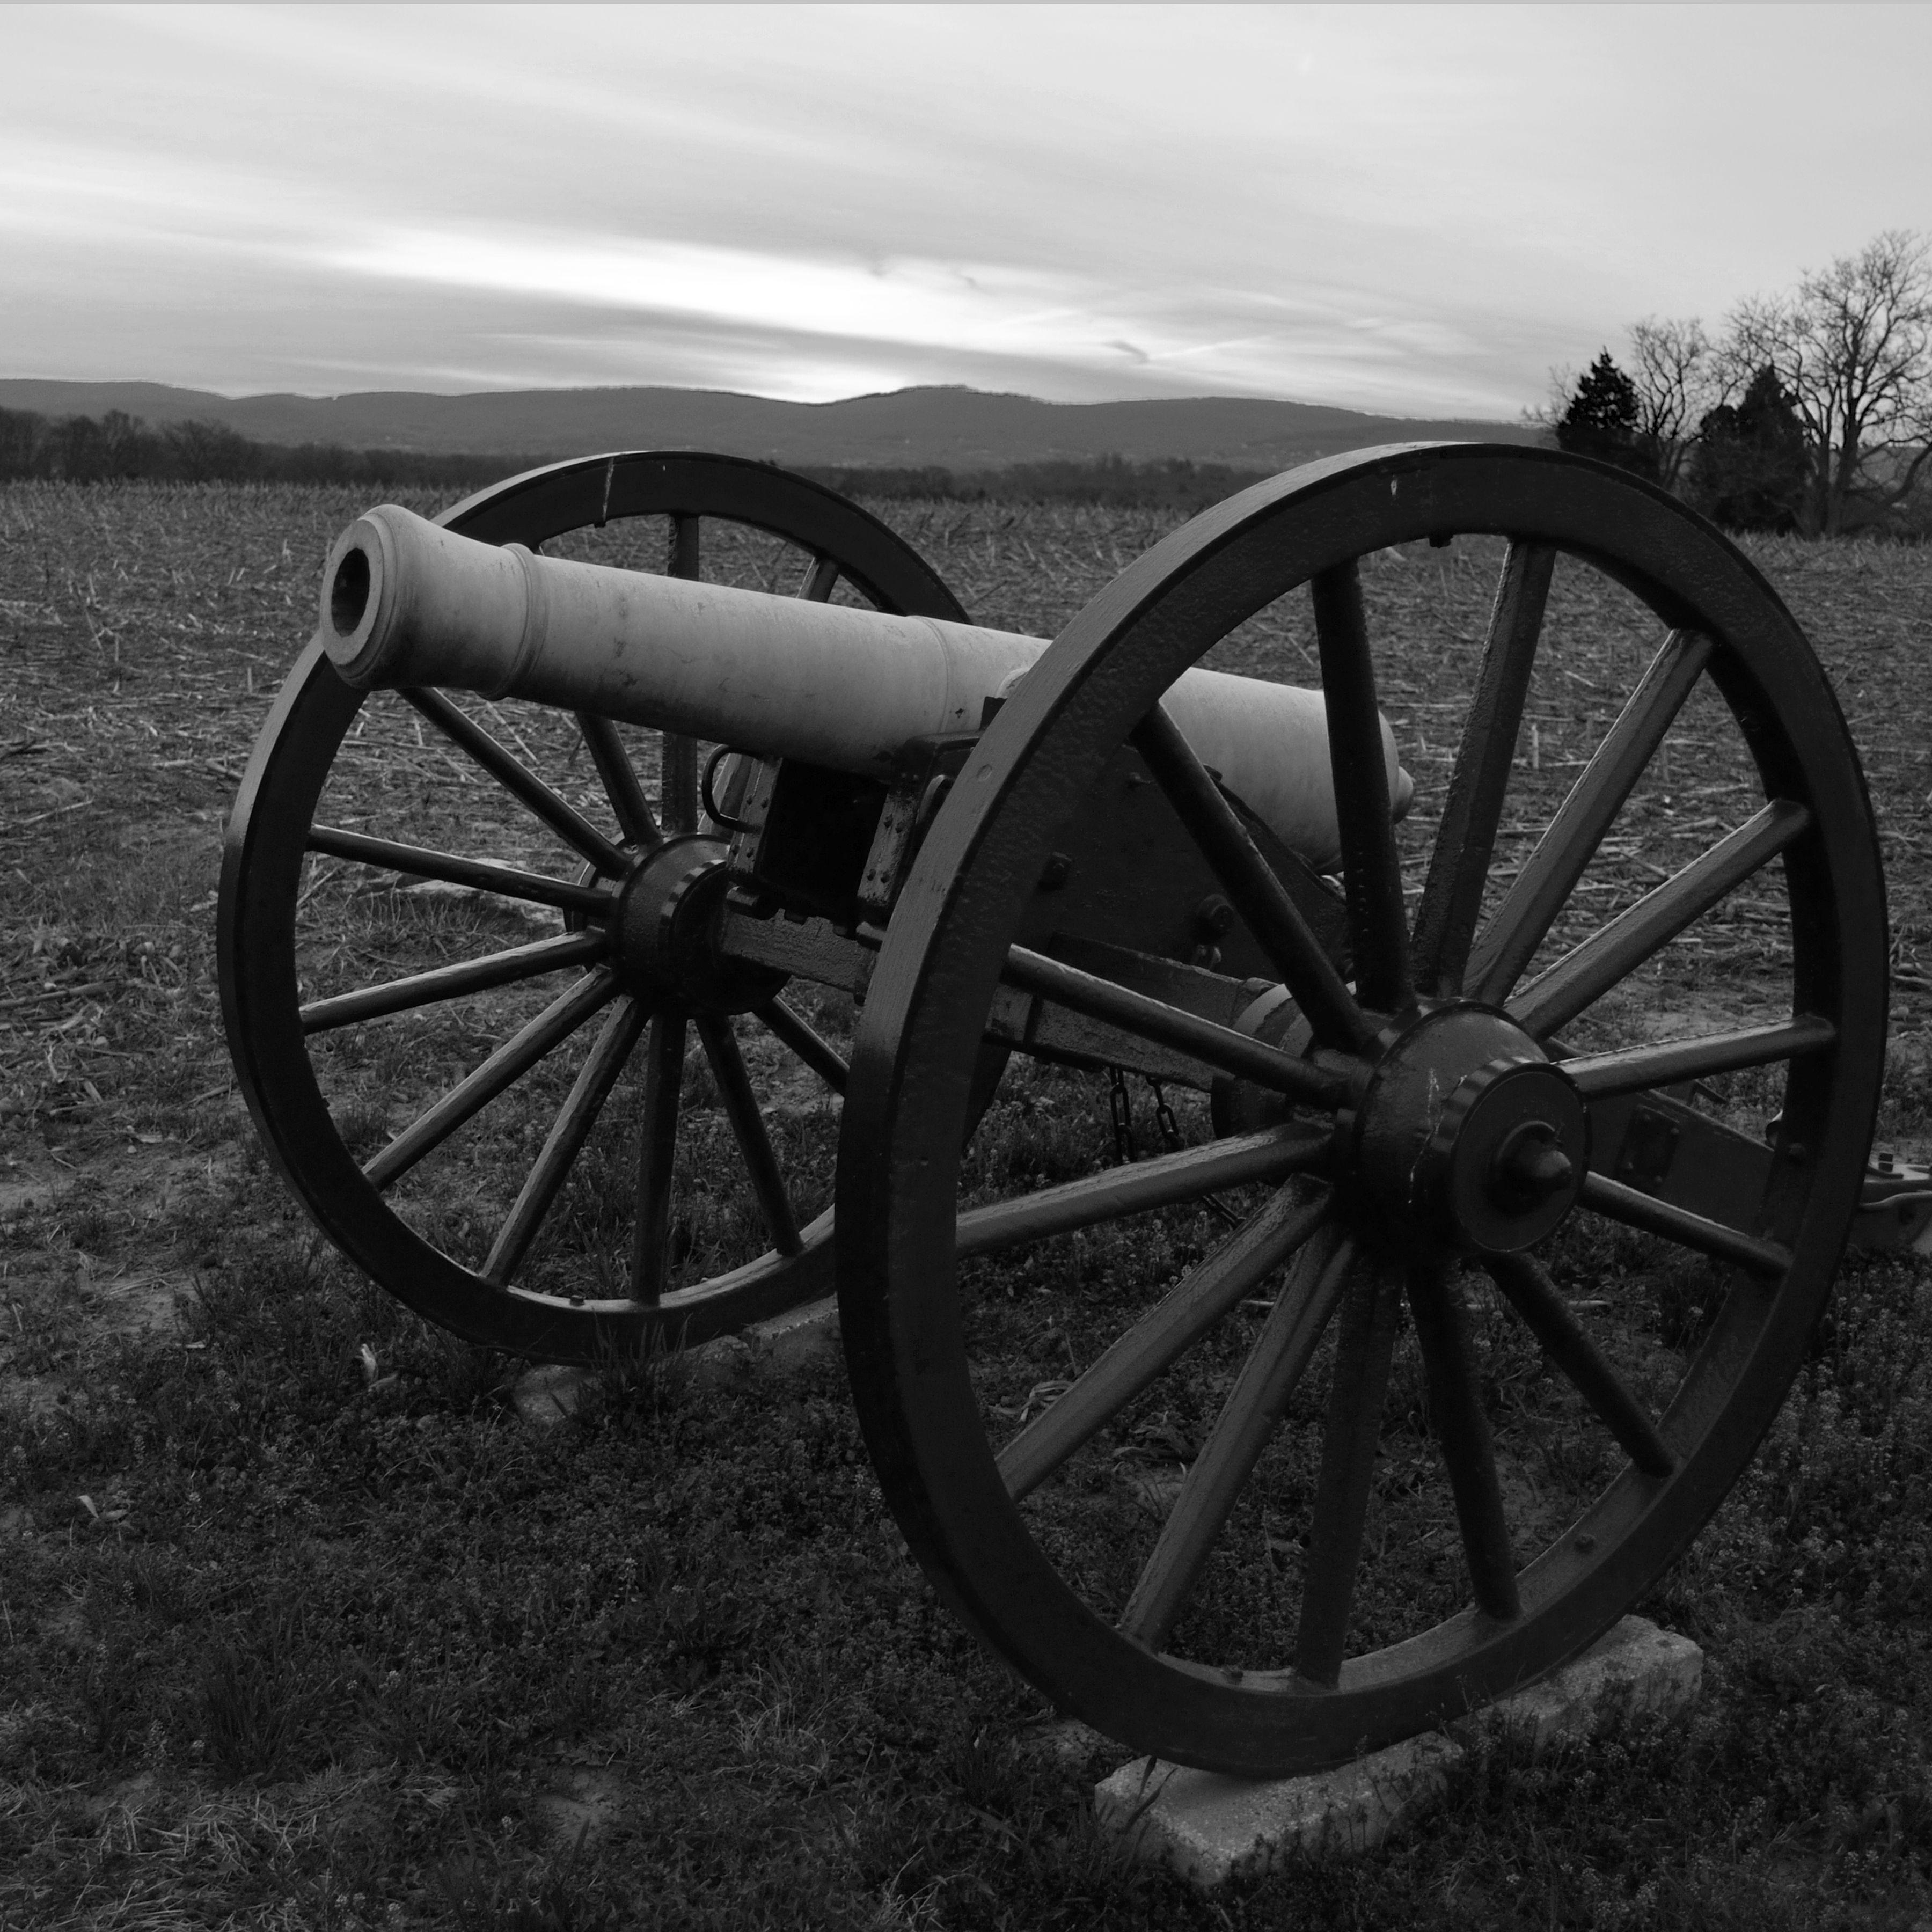 Canon at Antietam Battlefield.  Photo credit: Steve Kappel Photography.  Instagram: Skappel26  #photography #blackandwhite #canons #civilwar #history #americanhistory